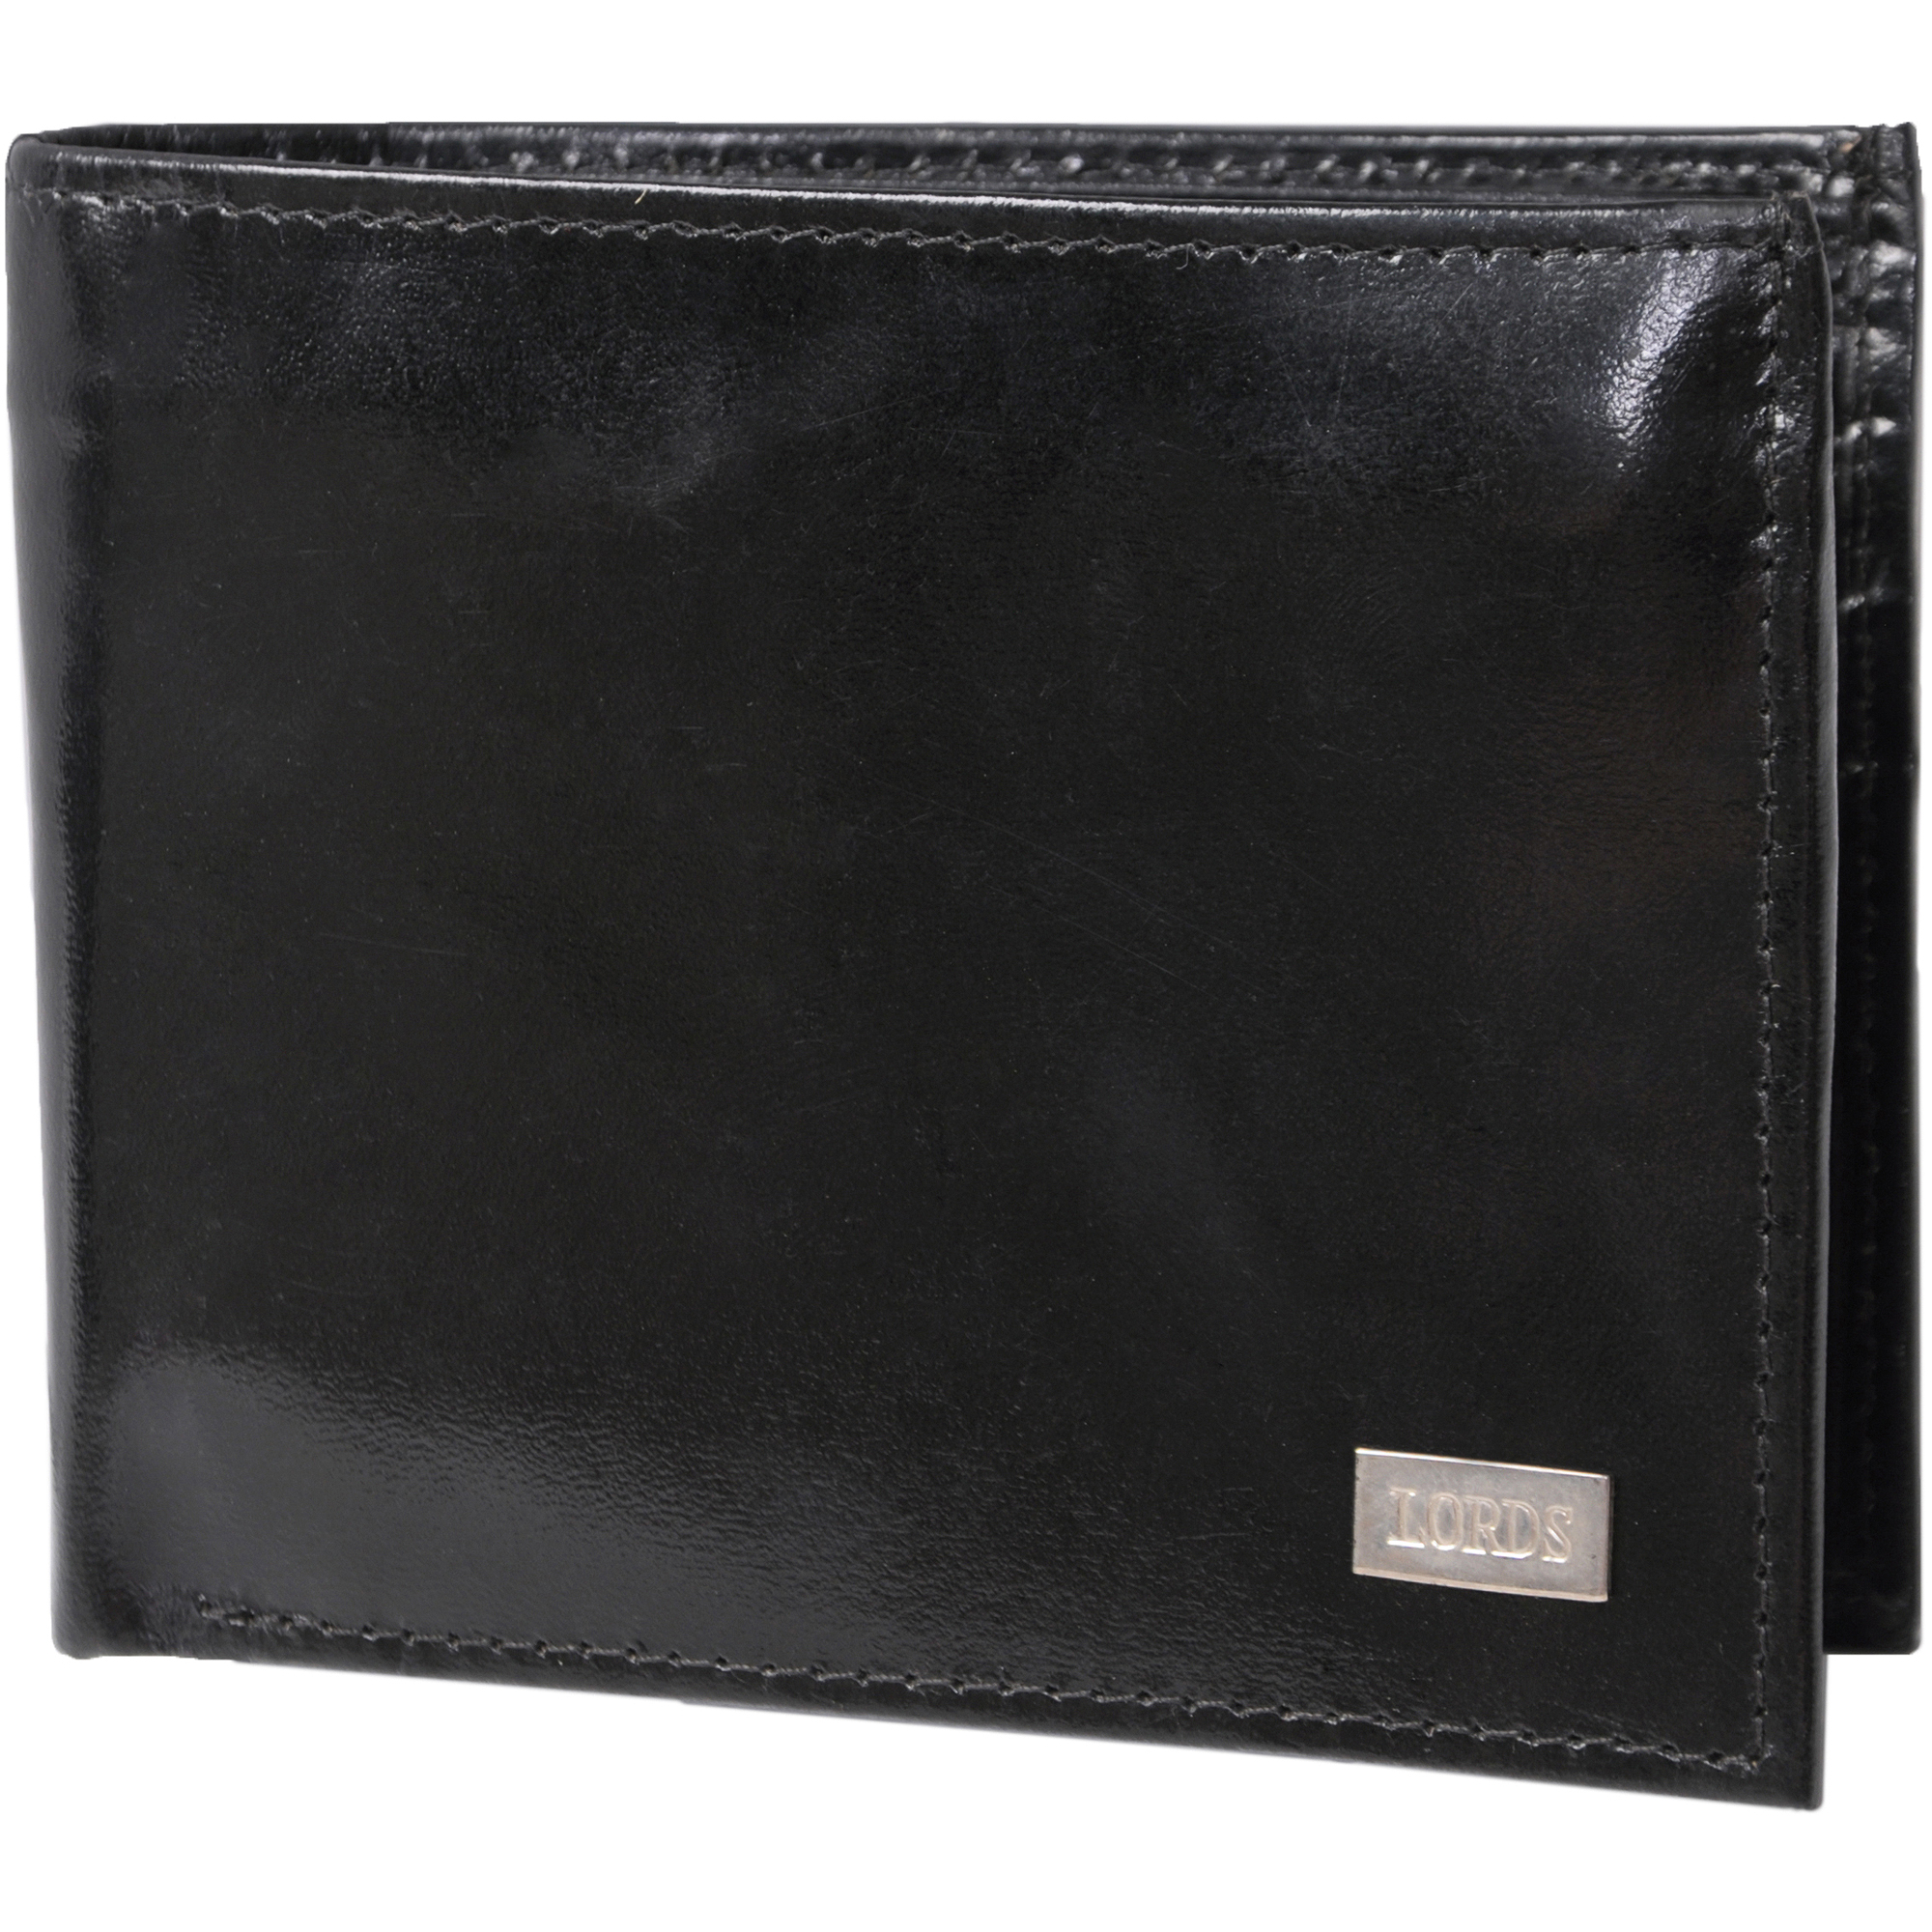 Daxx Men's Genuine Leather Horizontal Flap Bi-fold Wallet